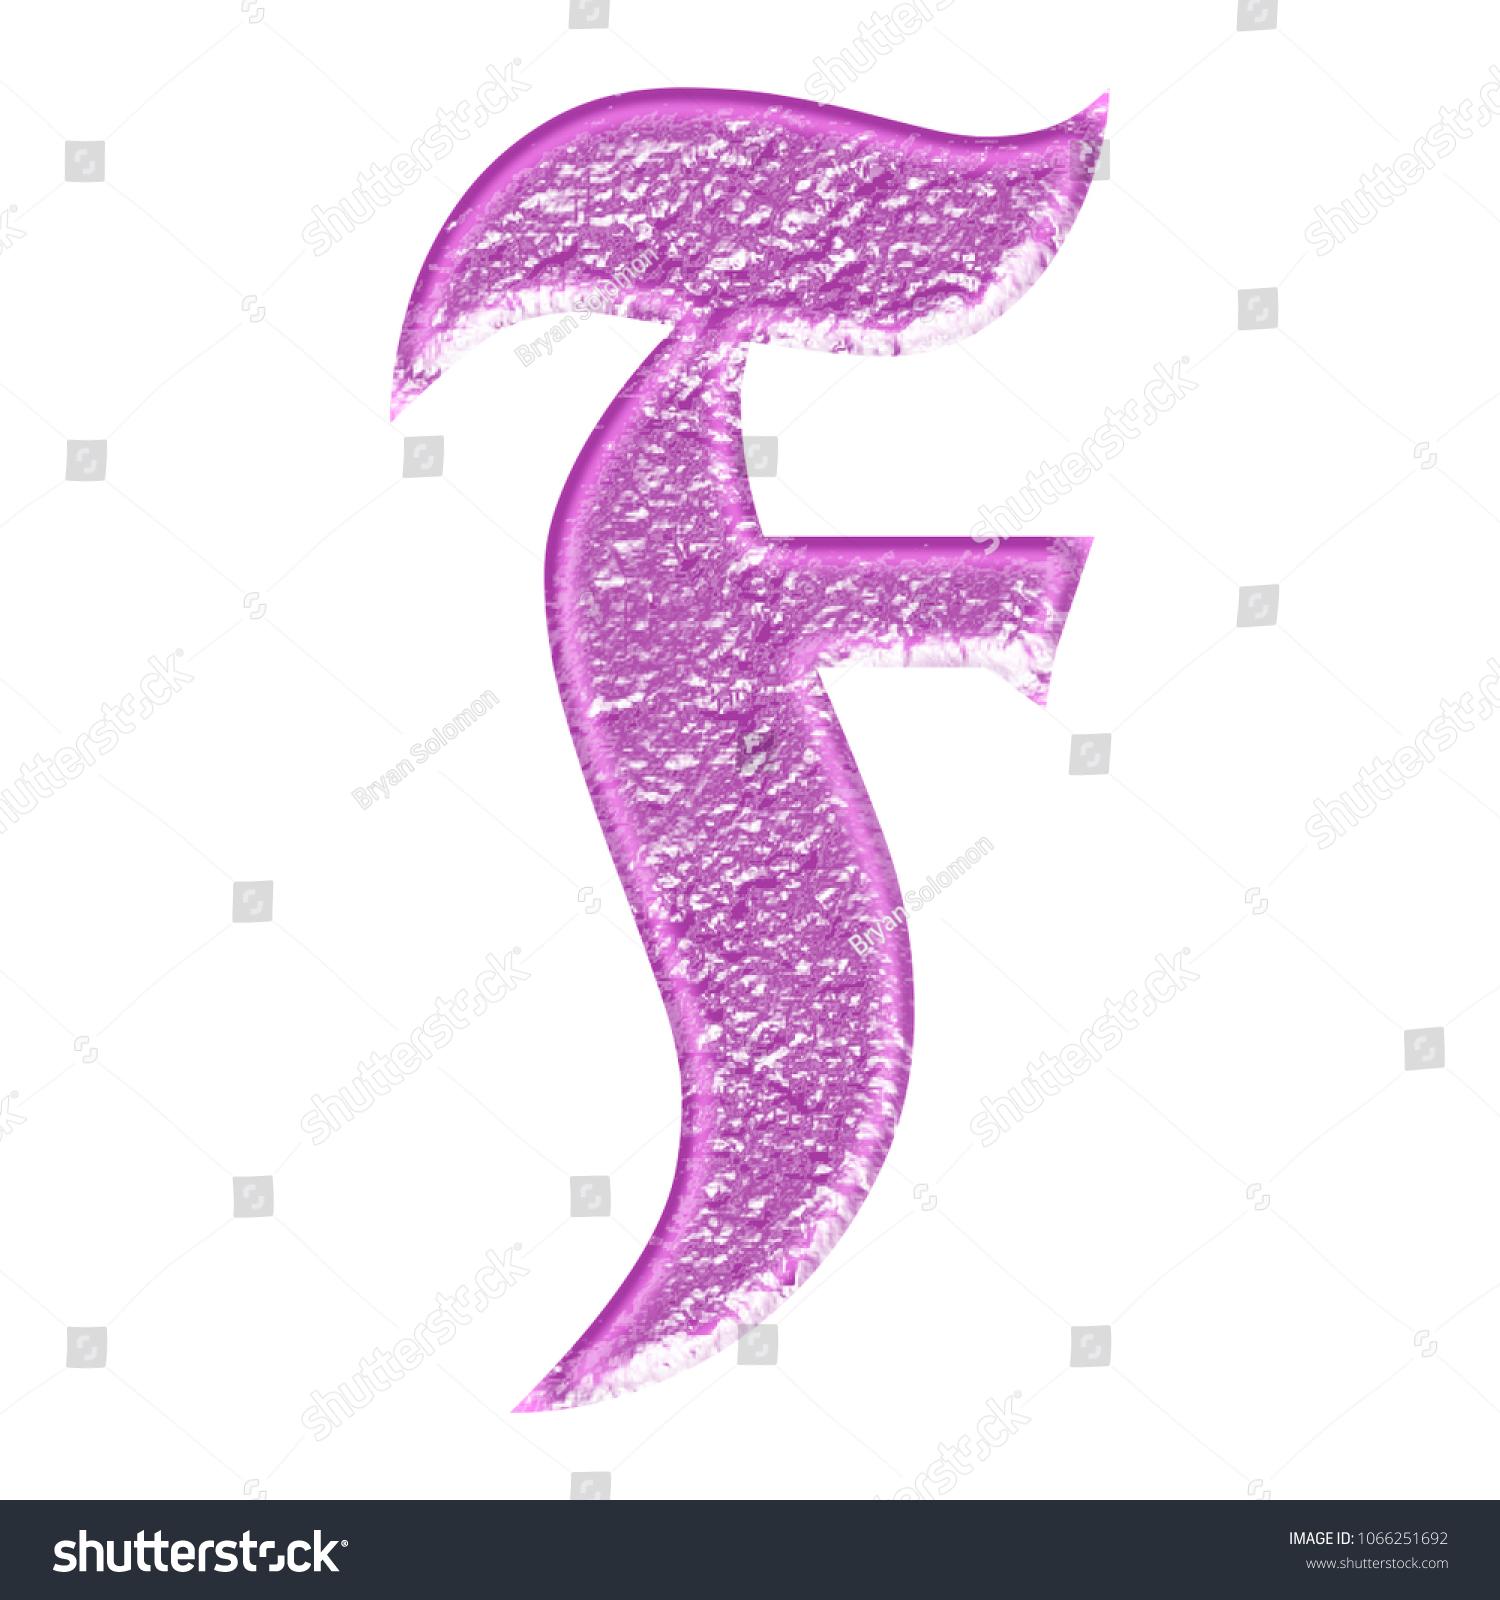 Worn Pink Metal Style Letter F Stock Illustration 1066251692 ...